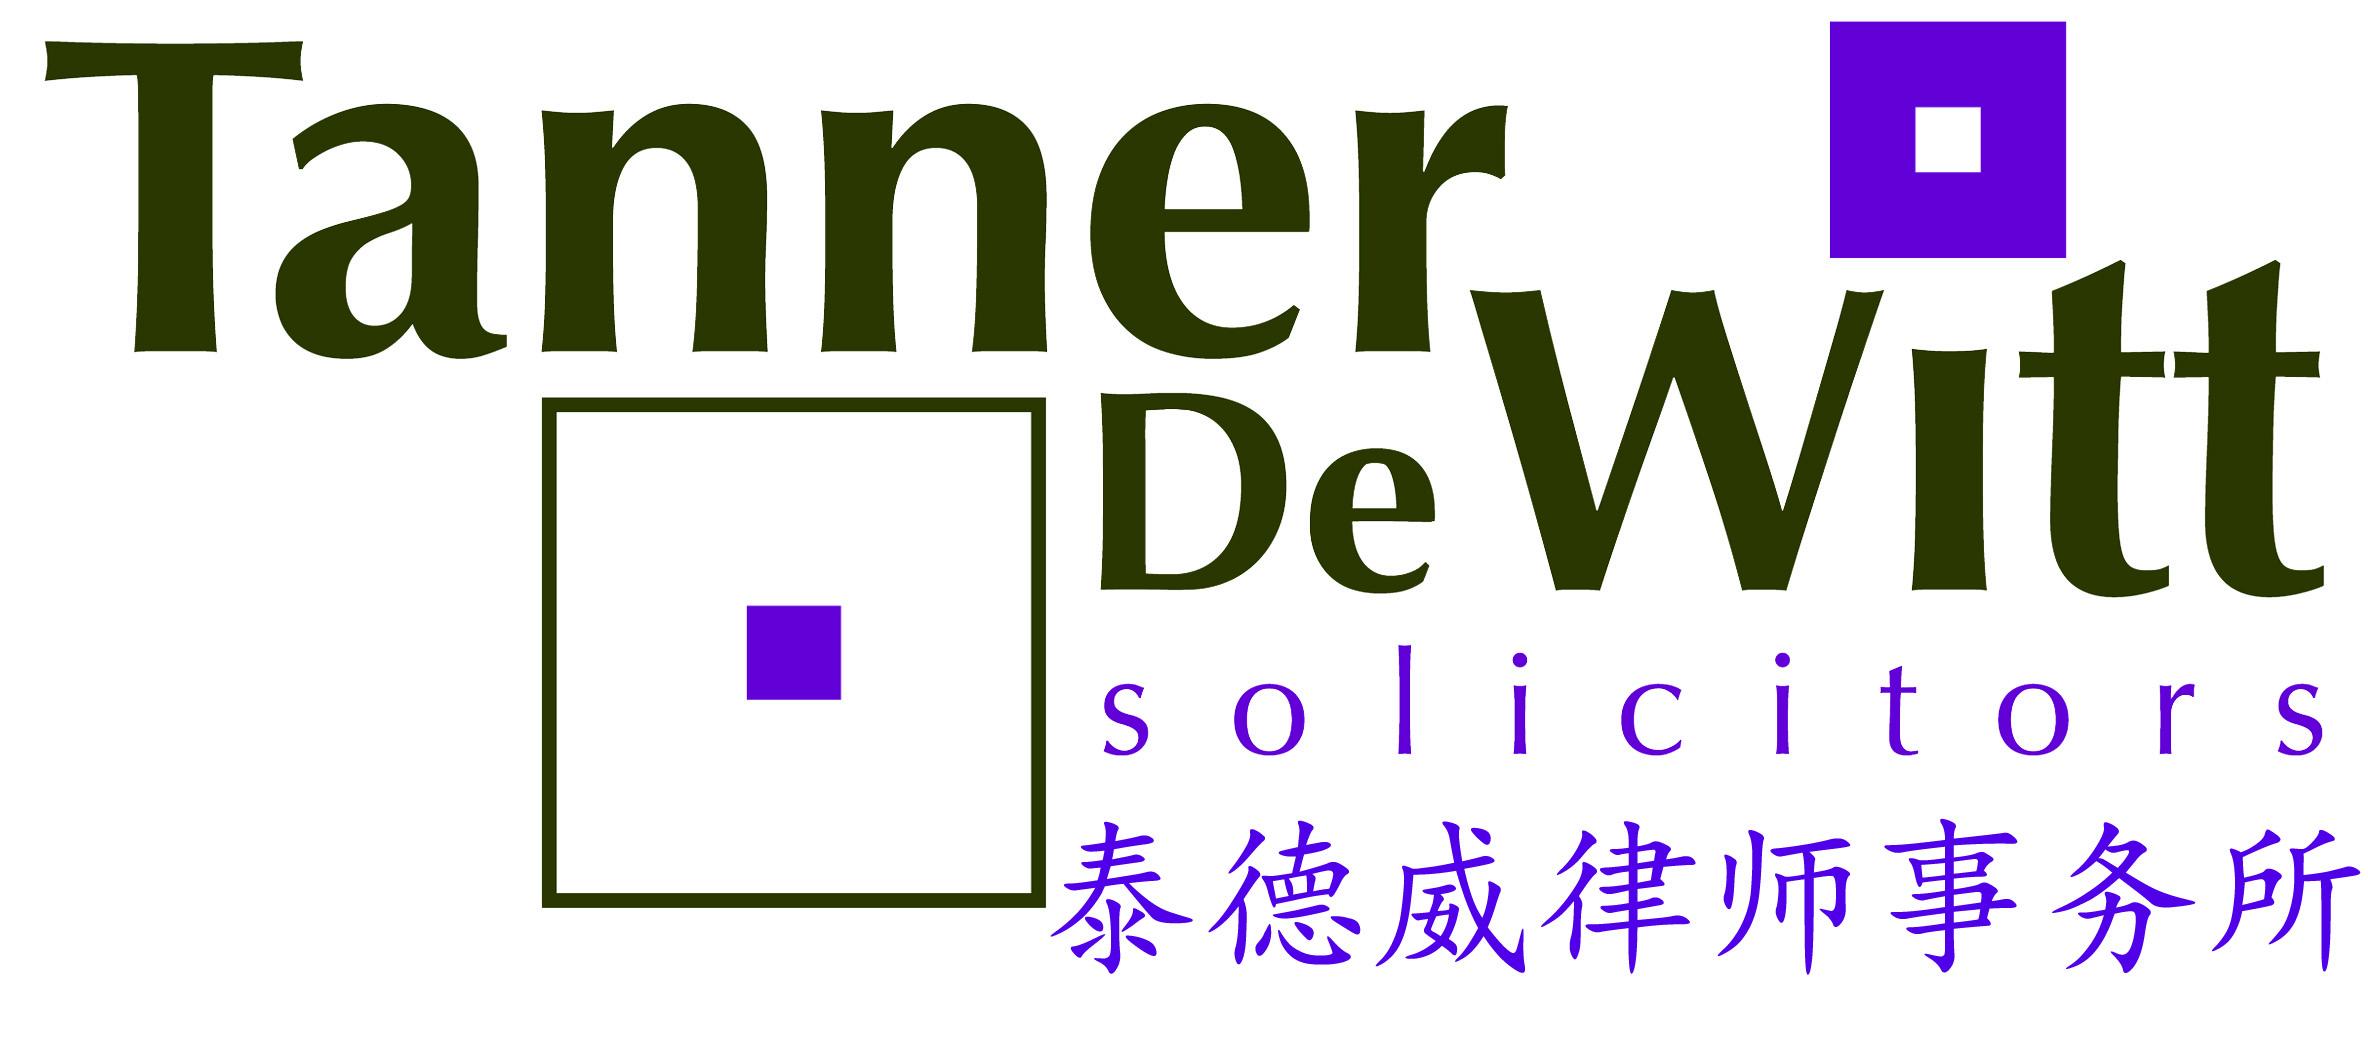 未命名文件夹-TDWlogowChinese